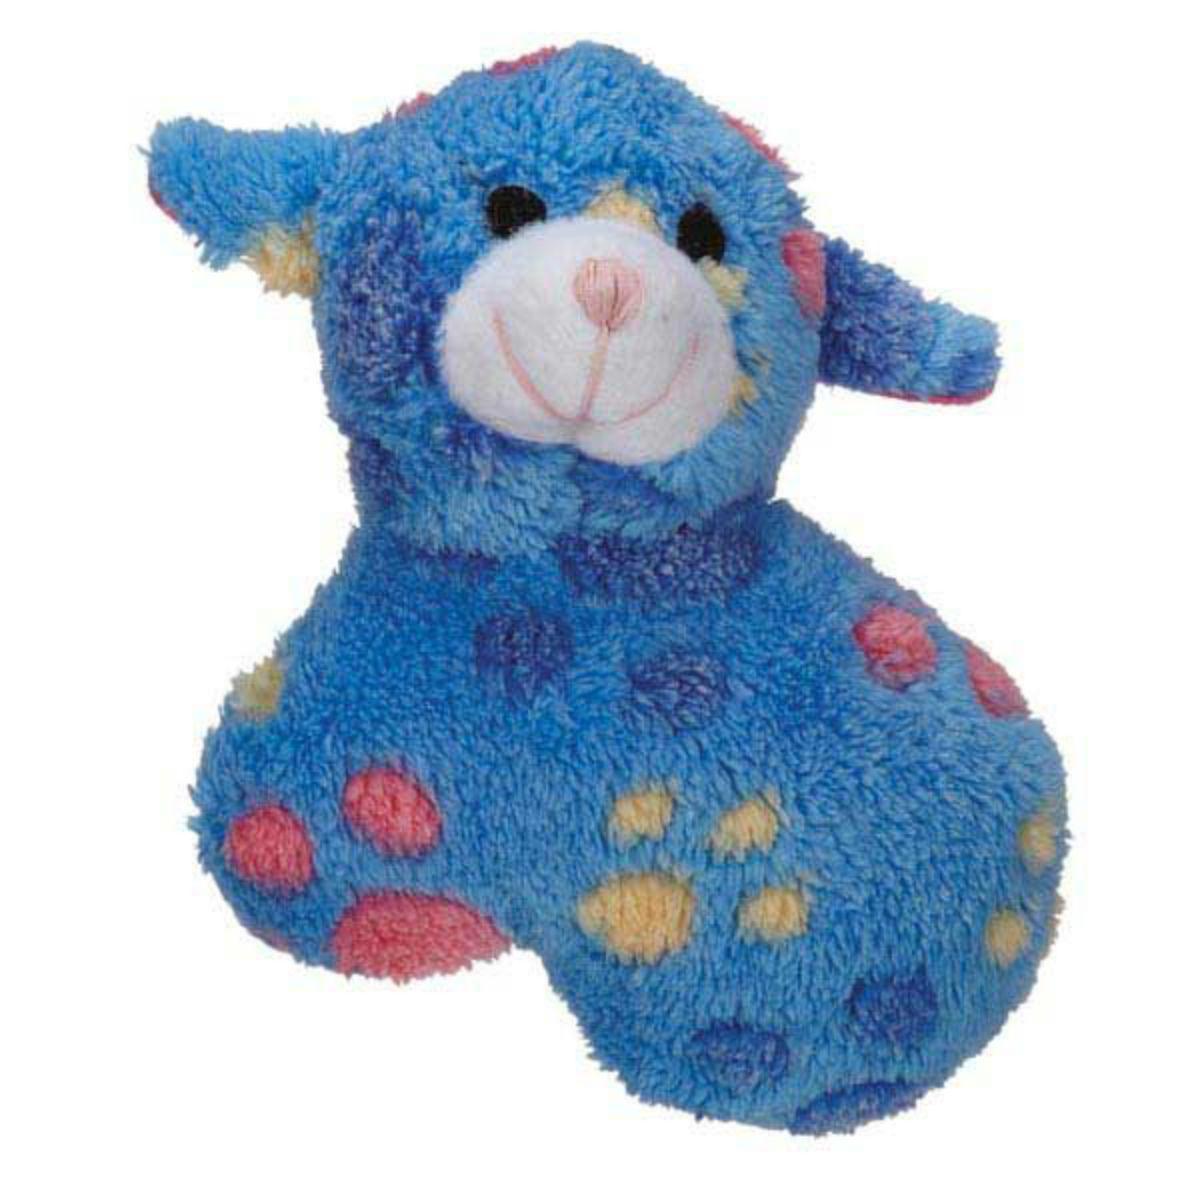 Zanies Silly Squad Dog Toy - Lamb